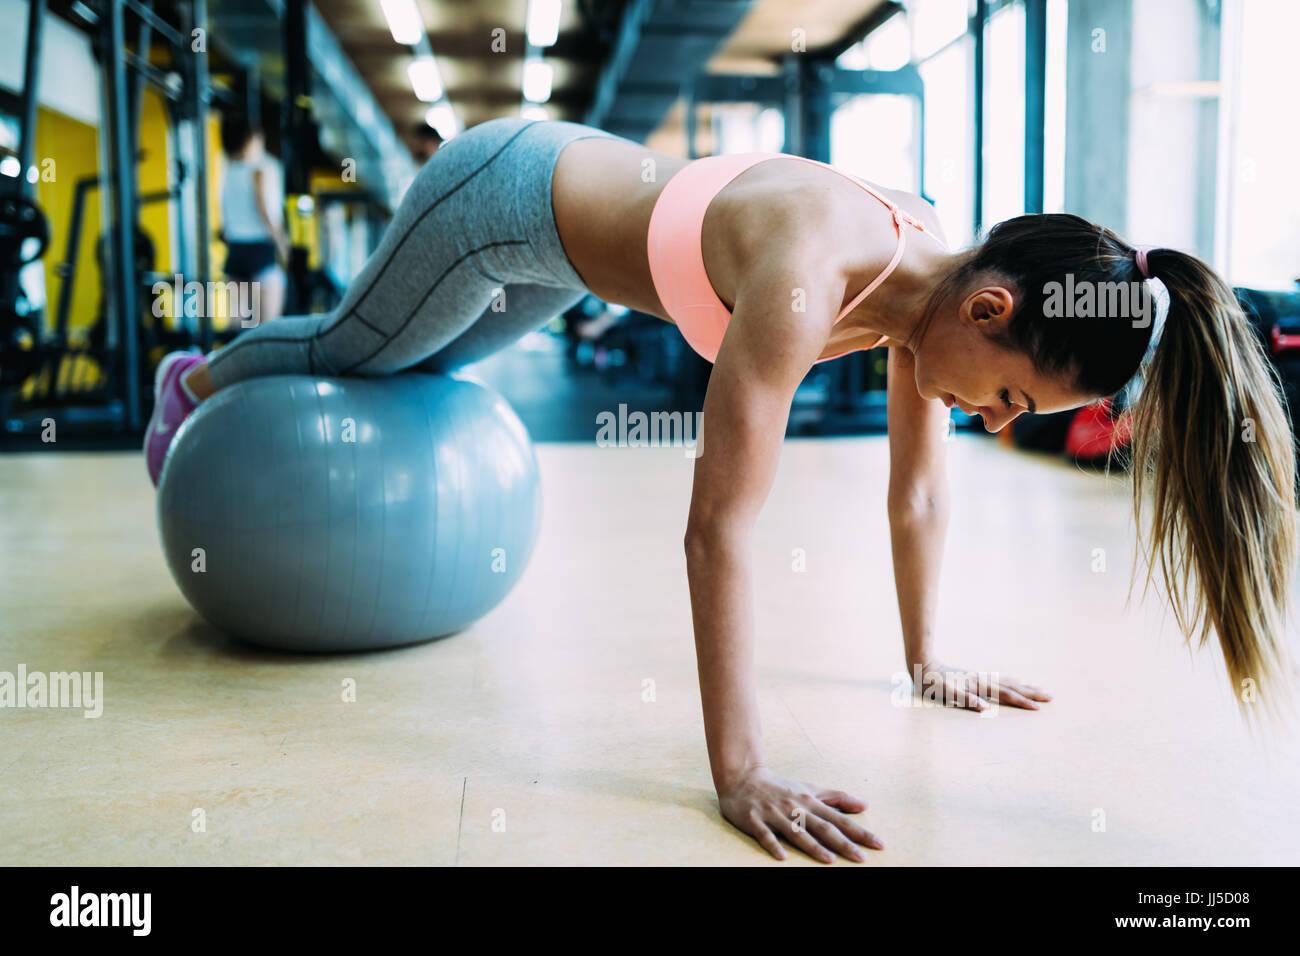 Donna Fitness lavoro ups push in palestra Immagini Stock